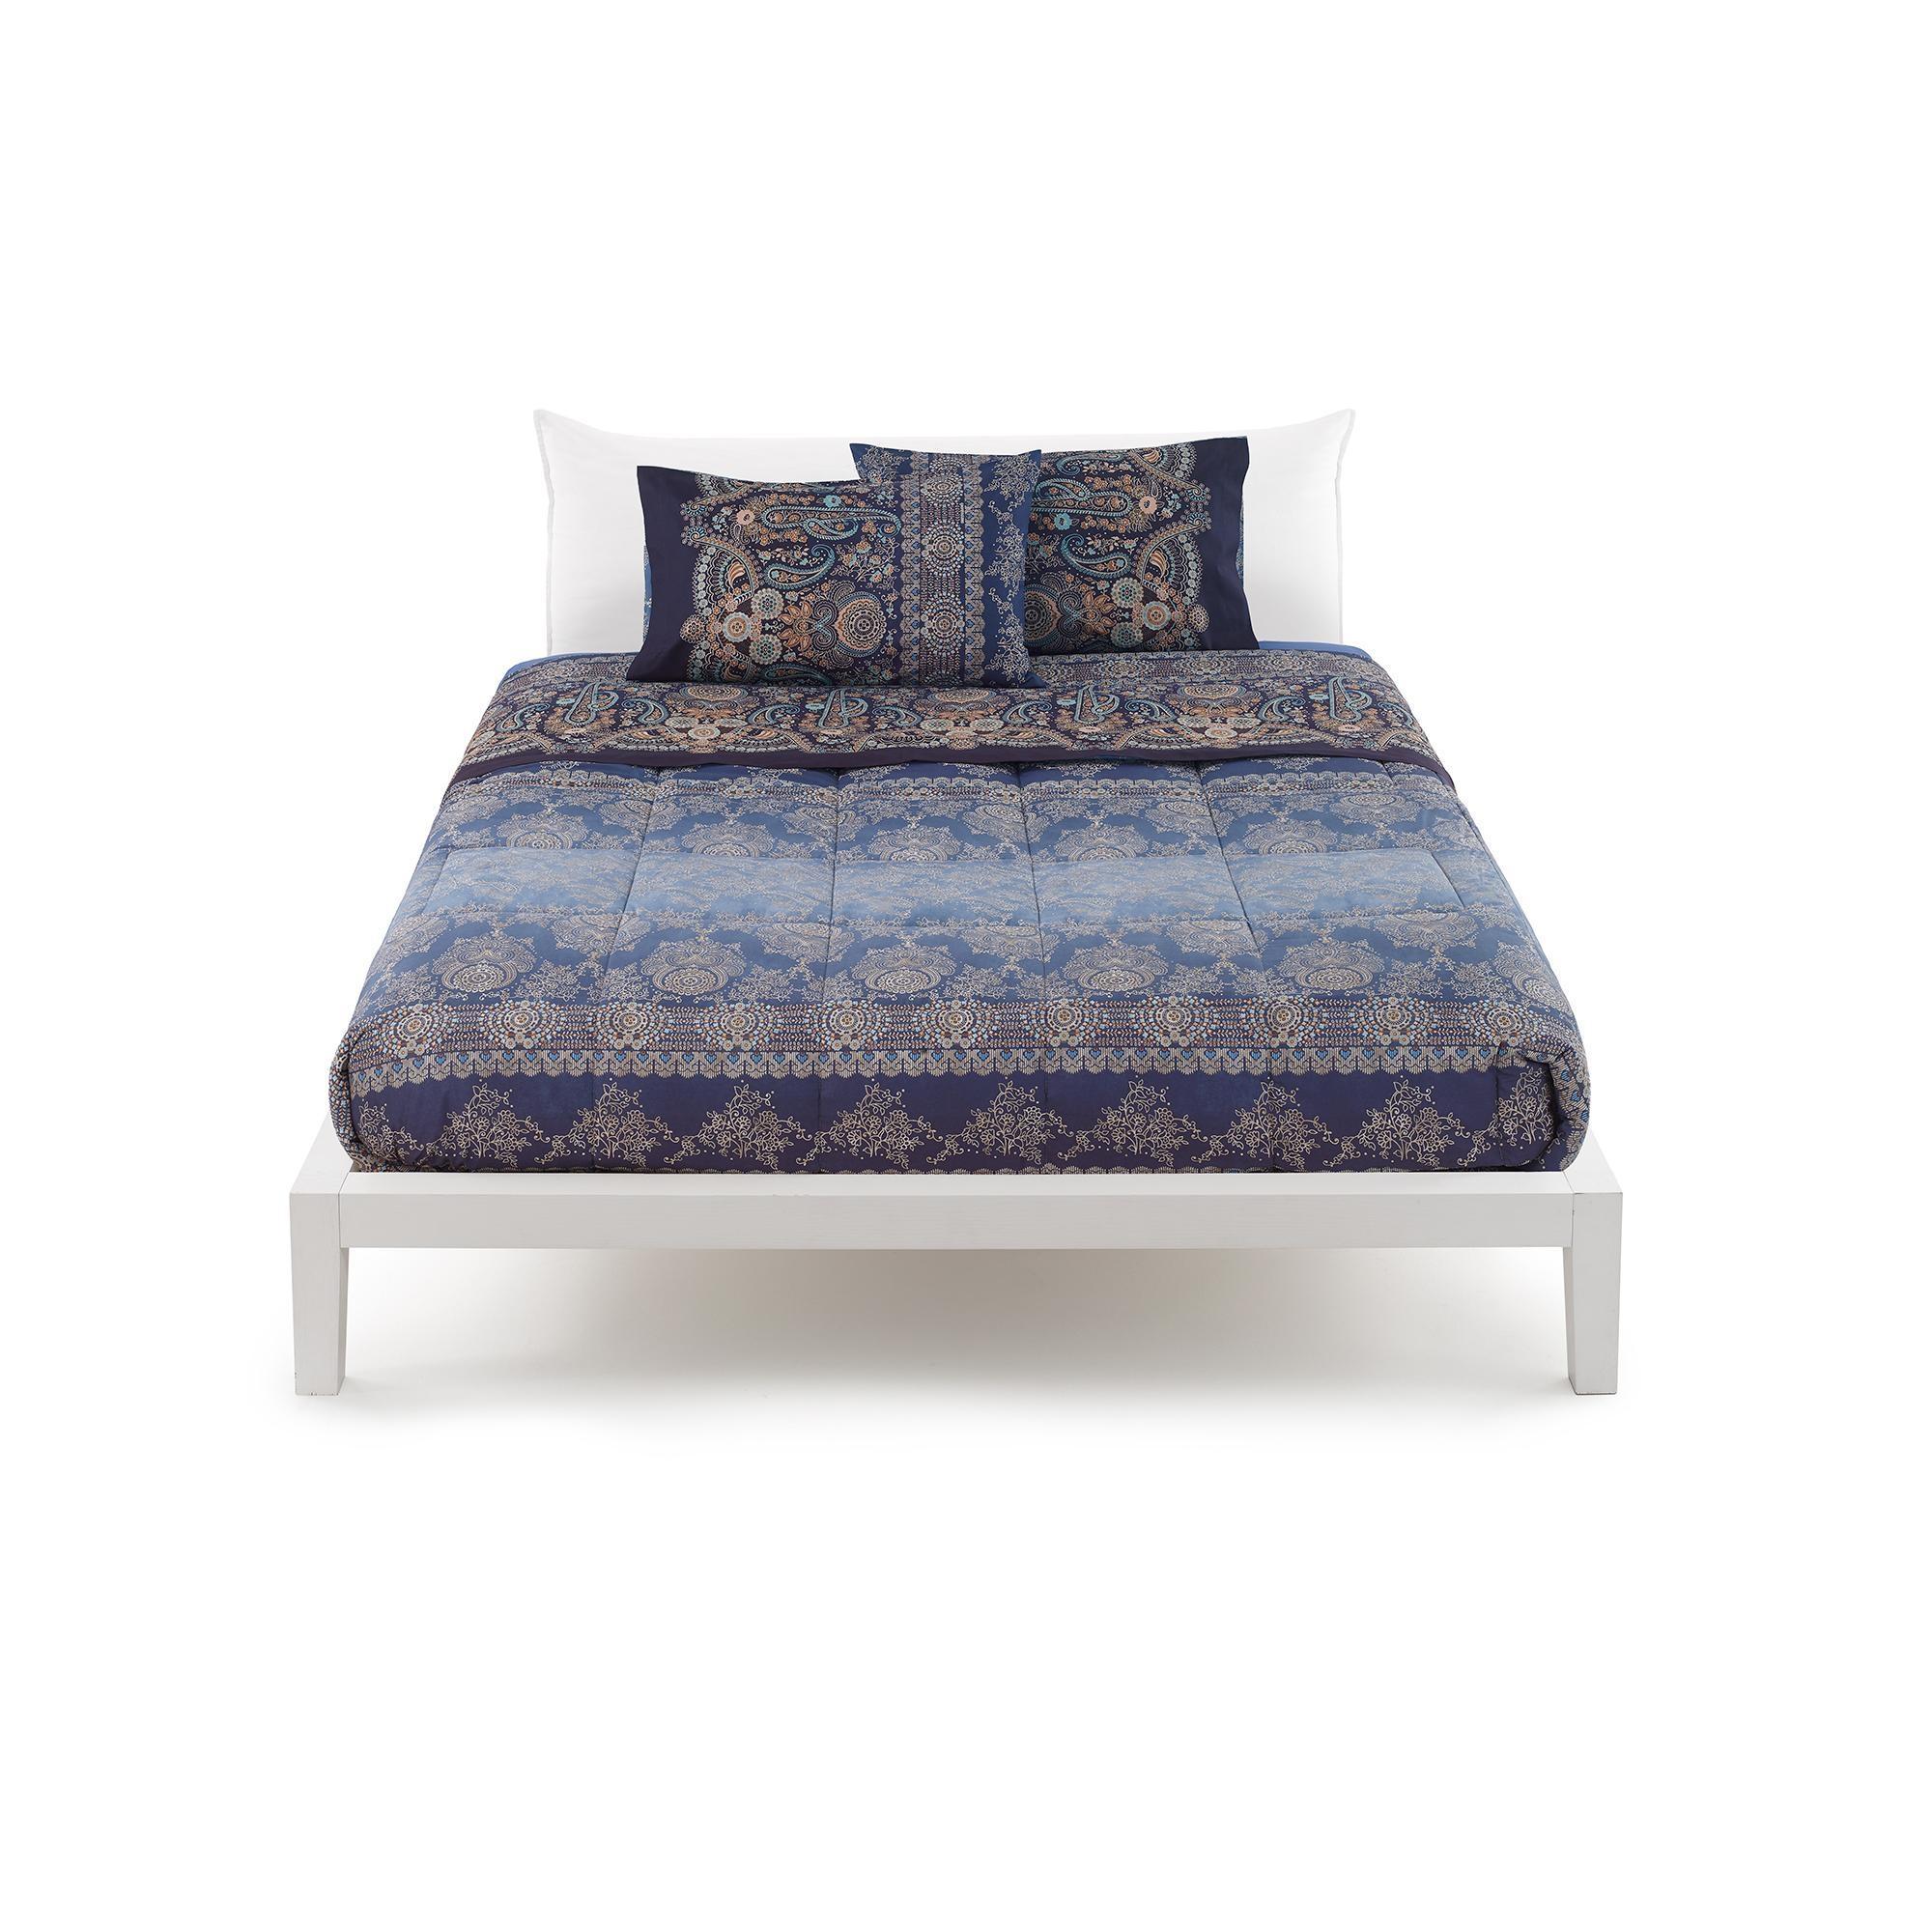 0806c7c563 Granfoulard-Blattset Bassetti double 2 Quadrate GRAN PARADISO v.3 blau